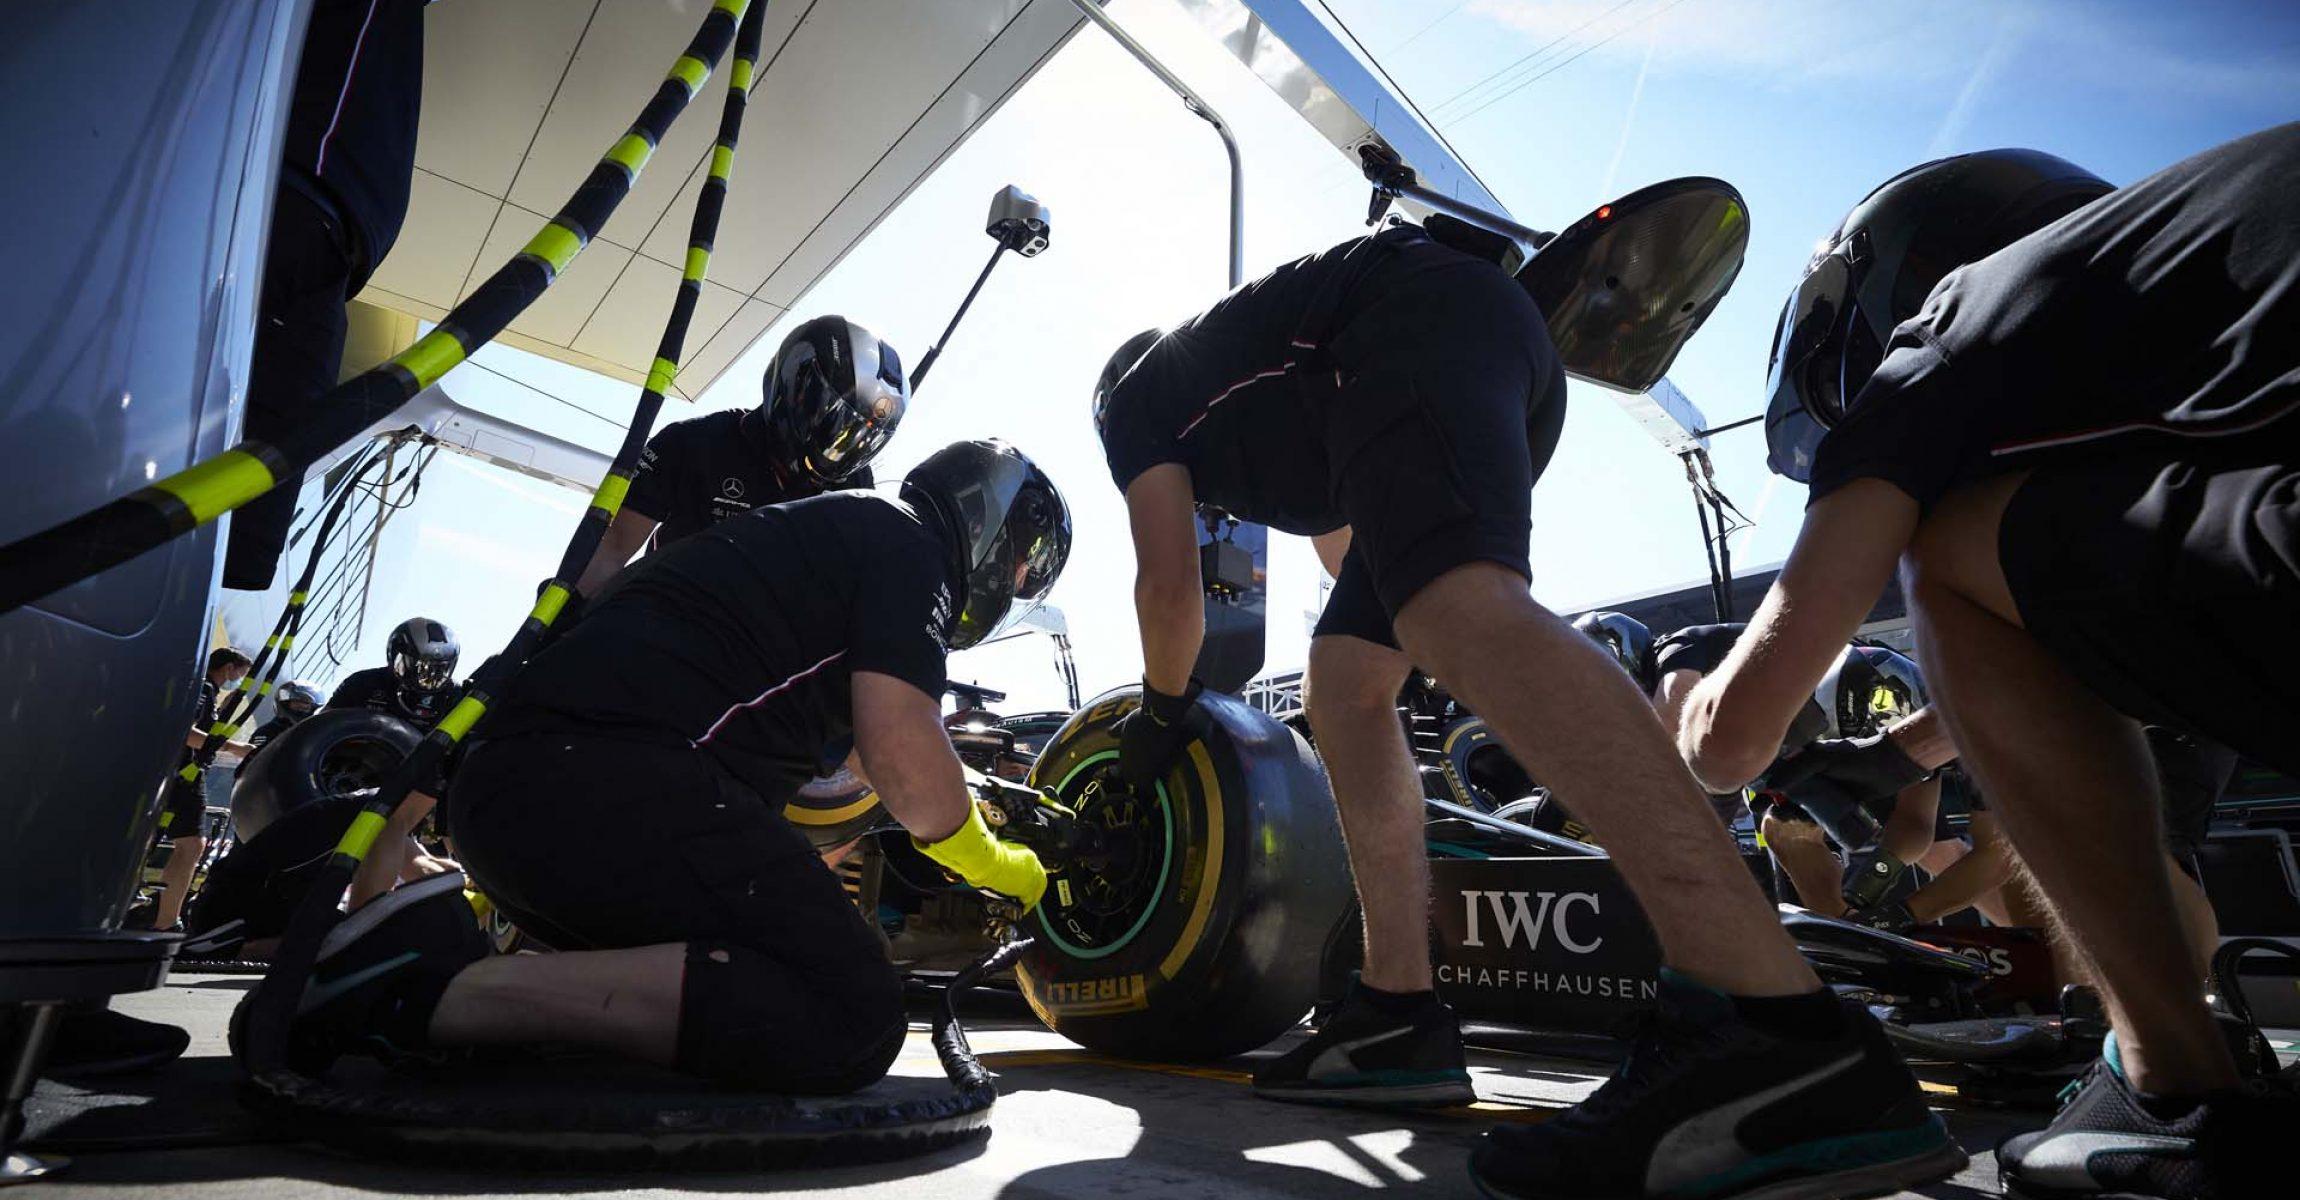 2020 Styrian Grand Prix, Friday - Steve Etherington Mercedes pitstop